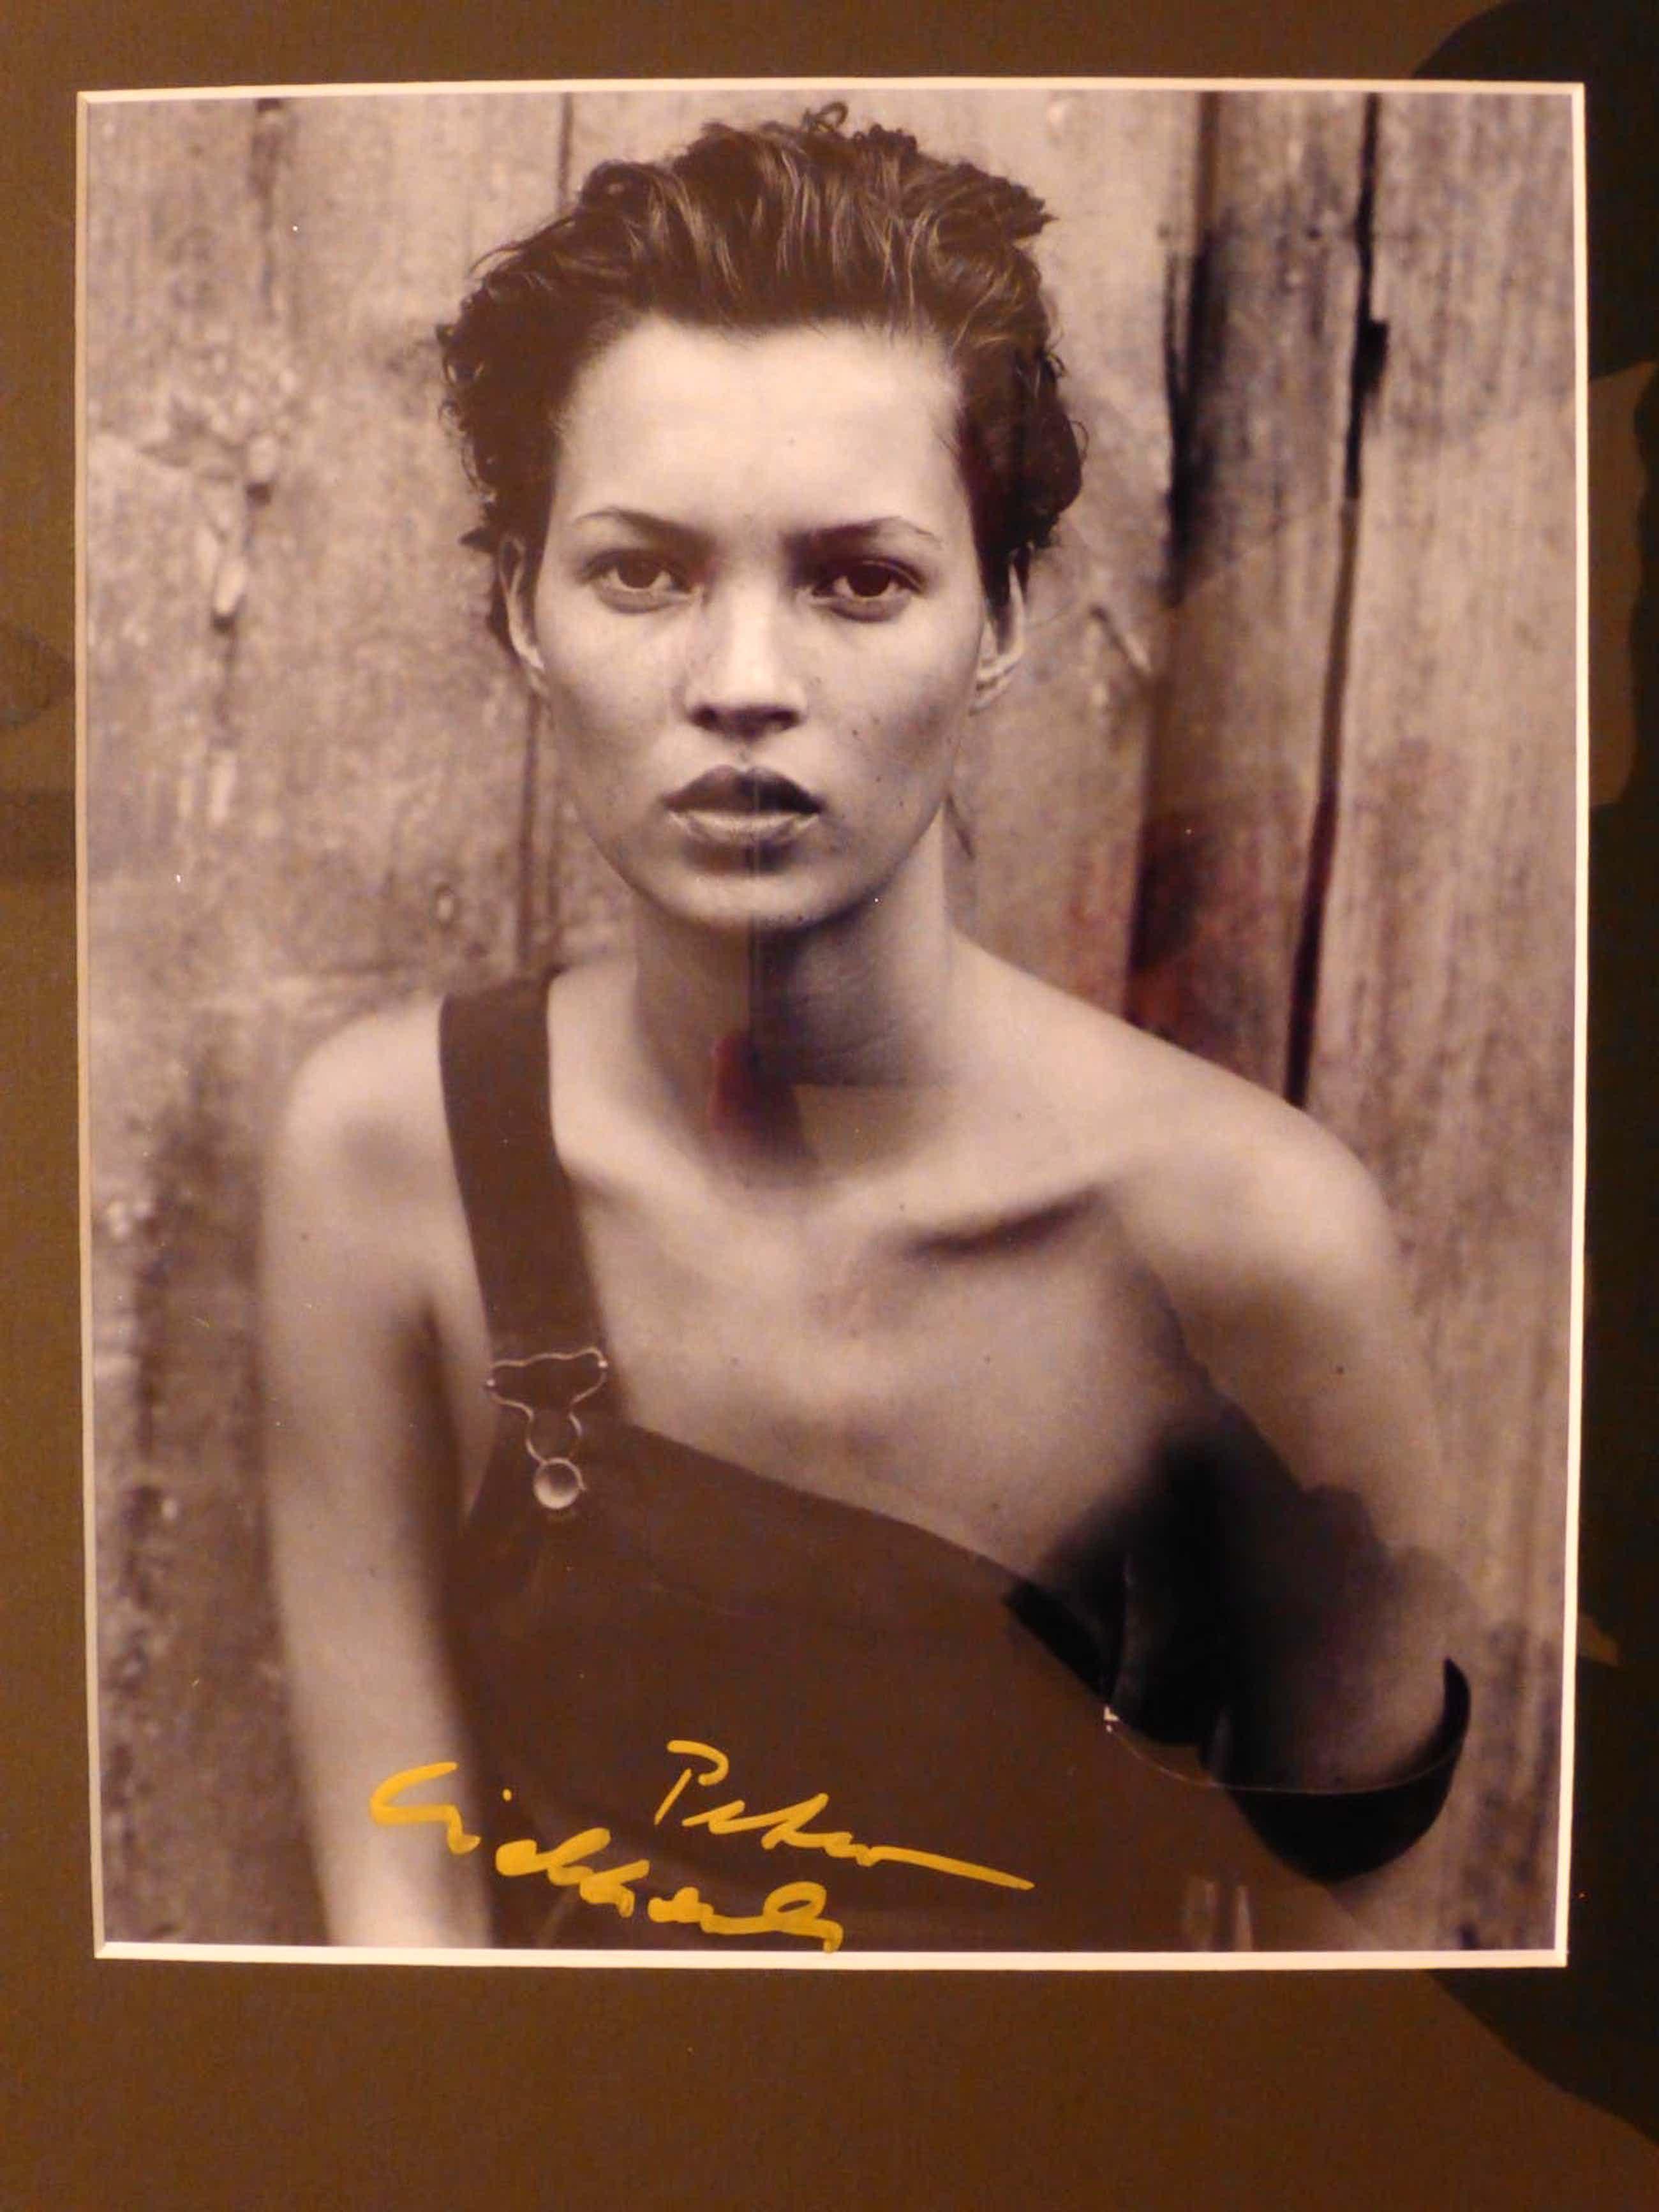 Peter Lindbergh - Kate Moss, handsigniert kopen? Bied vanaf 1790!